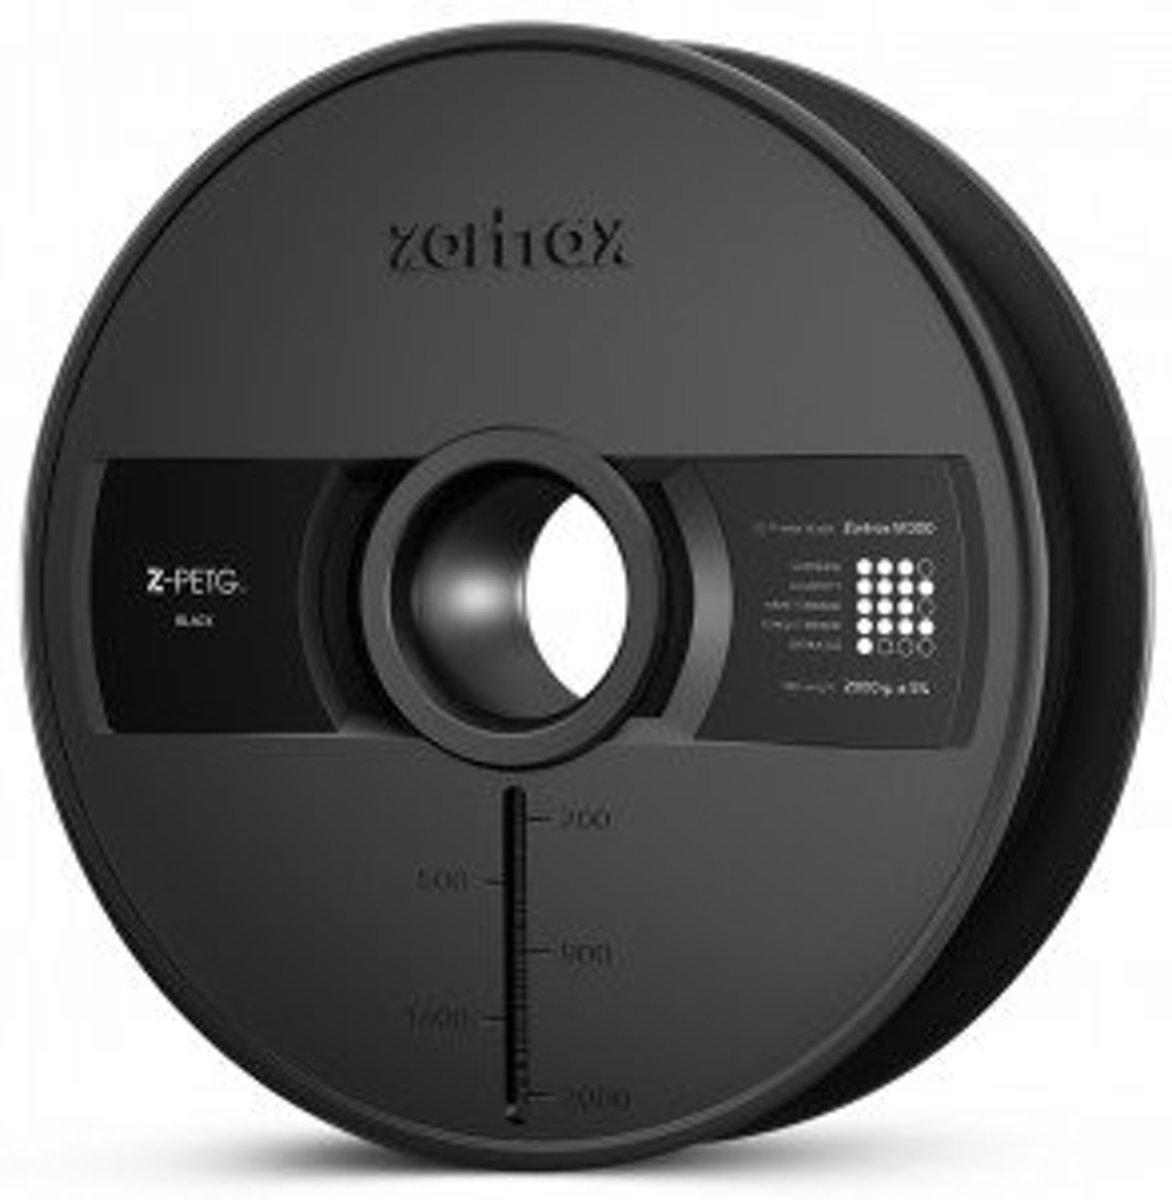 Zortrax Z-PETG Black 2kg M300